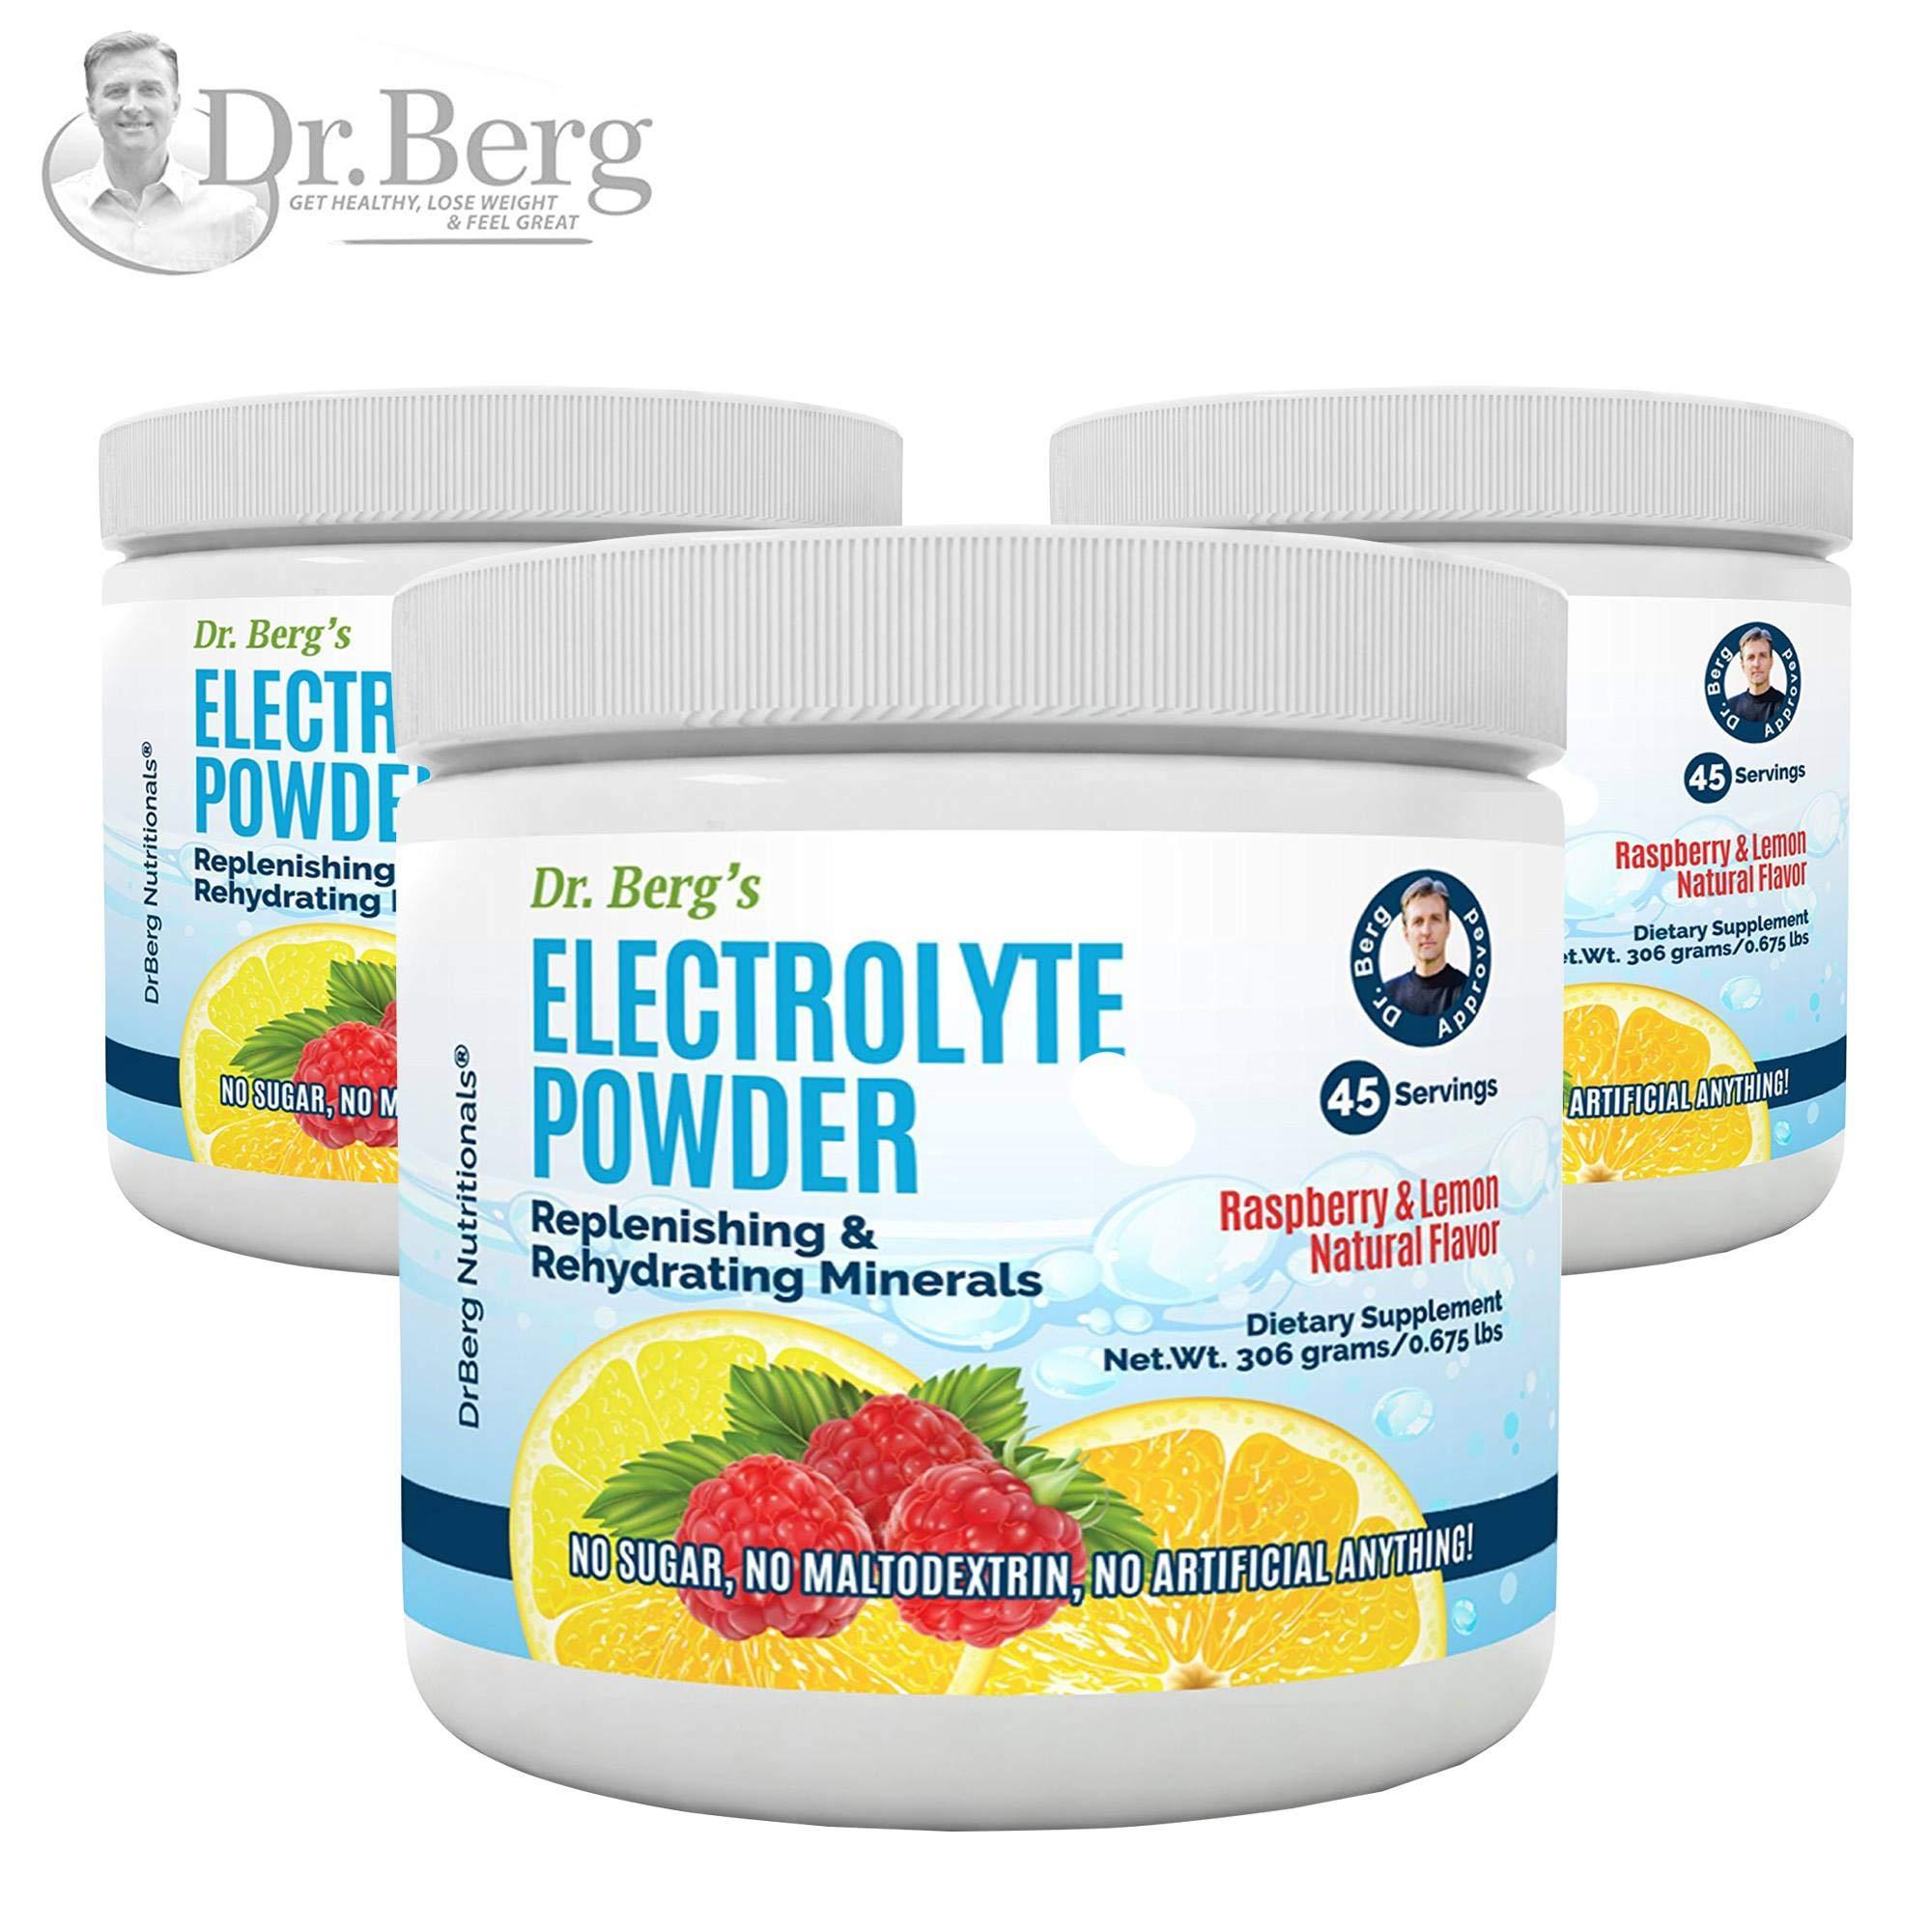 Dr. Berg's Electrolyte Powder, High Energy, Replenish & Rejuvenate Your Cells, 45 Servings, NO Maltodextrin or Sugar, Amazing Raspberry Lemon Flavor (3 Pack)